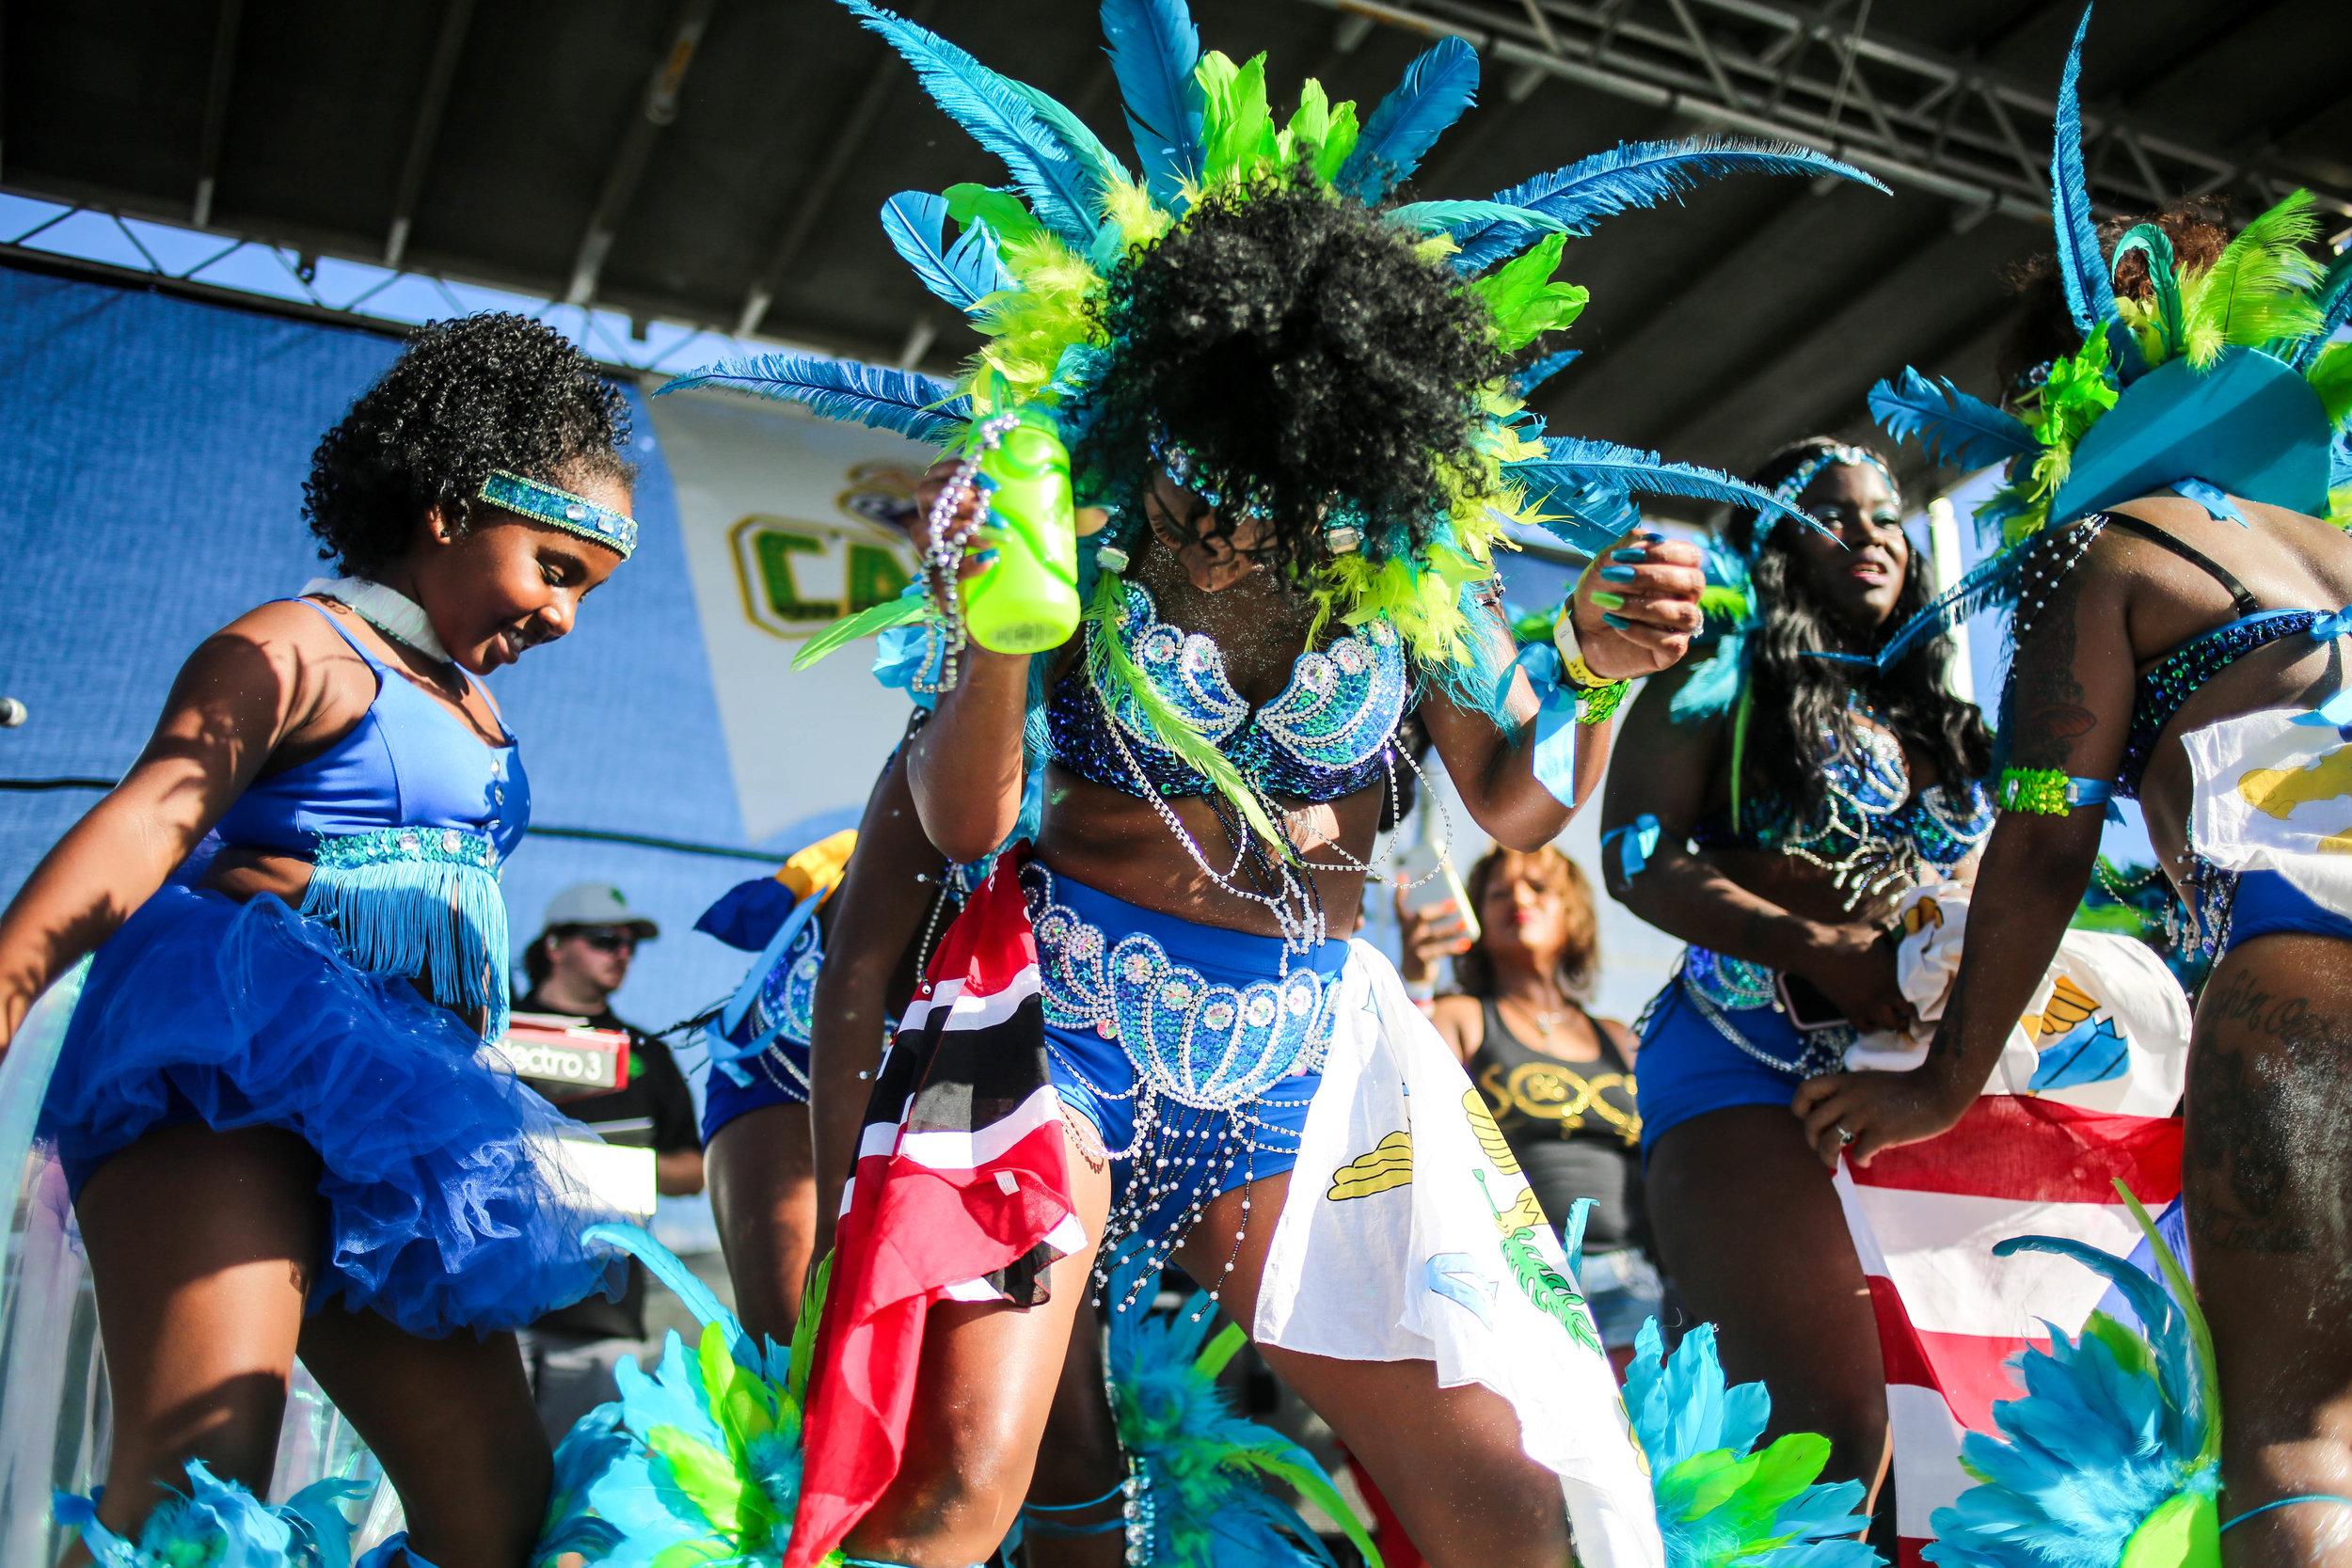 carnival new orleans nola caribbean festival soca reggae dance